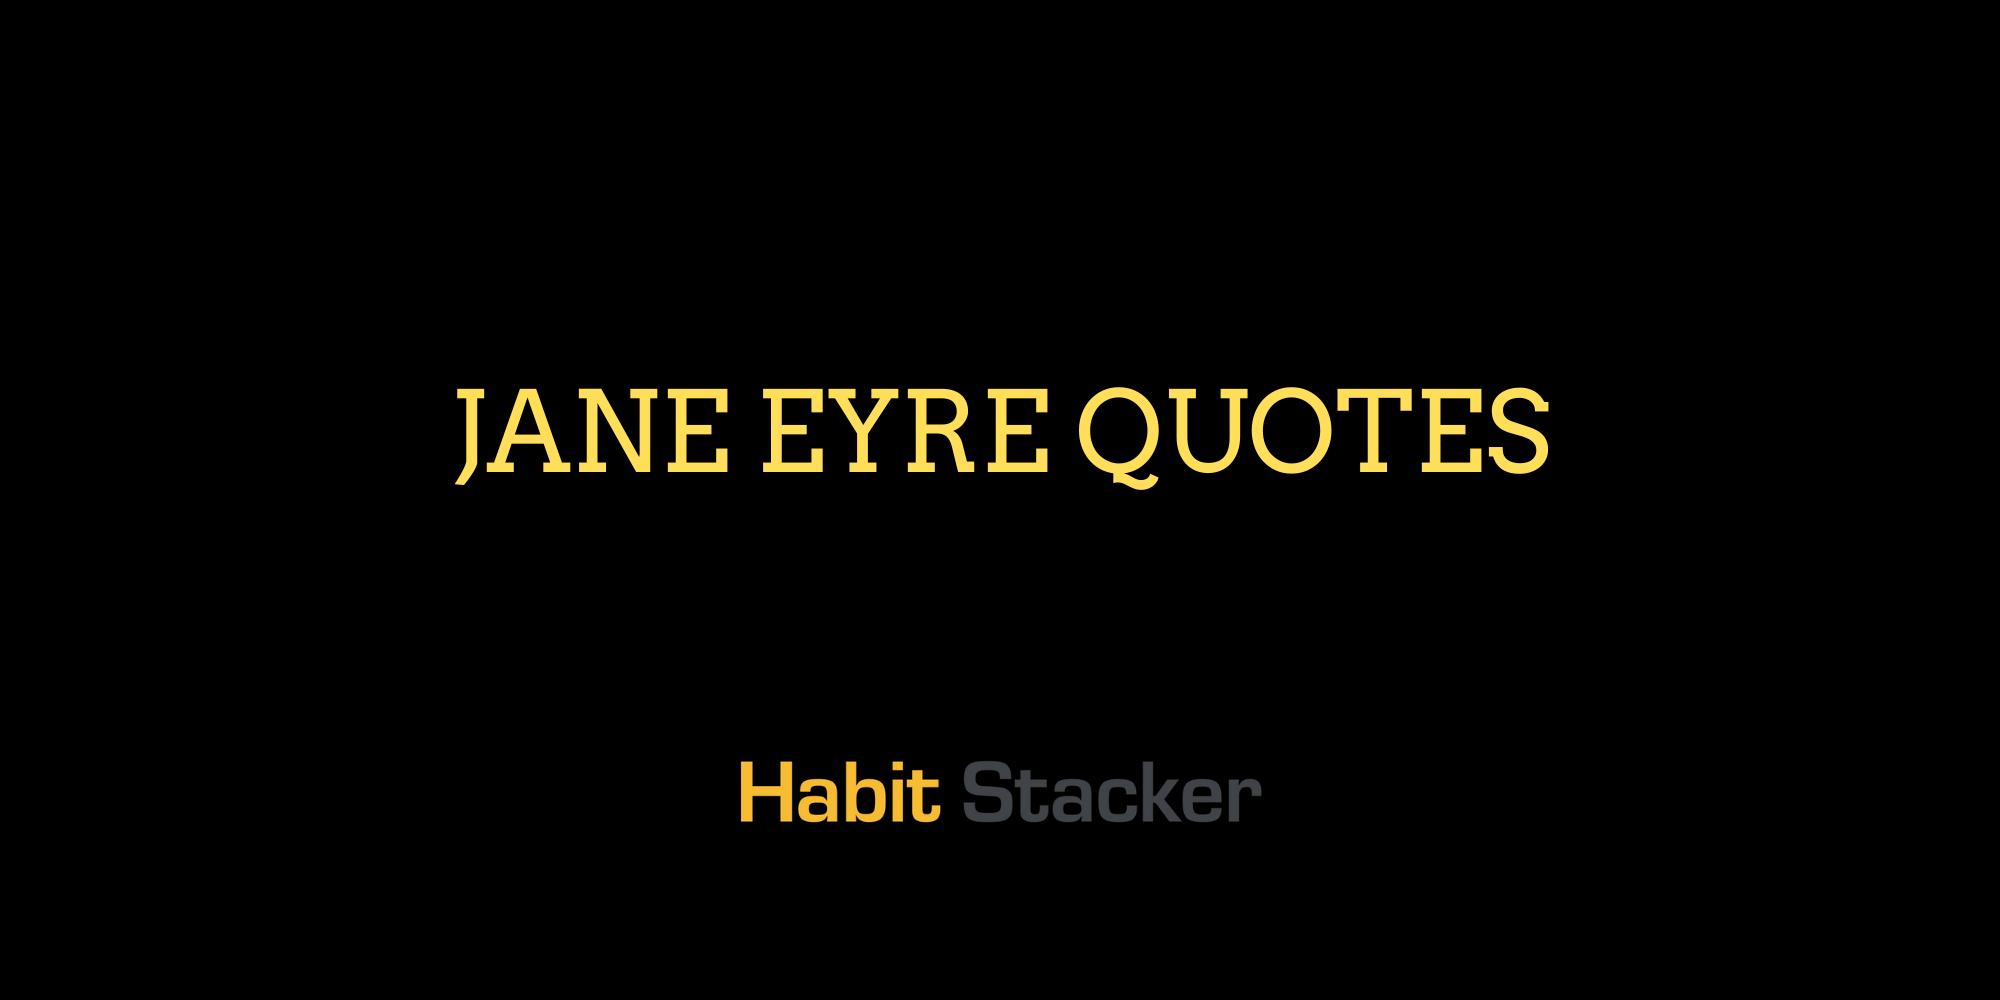 Jane Eyre Quotes